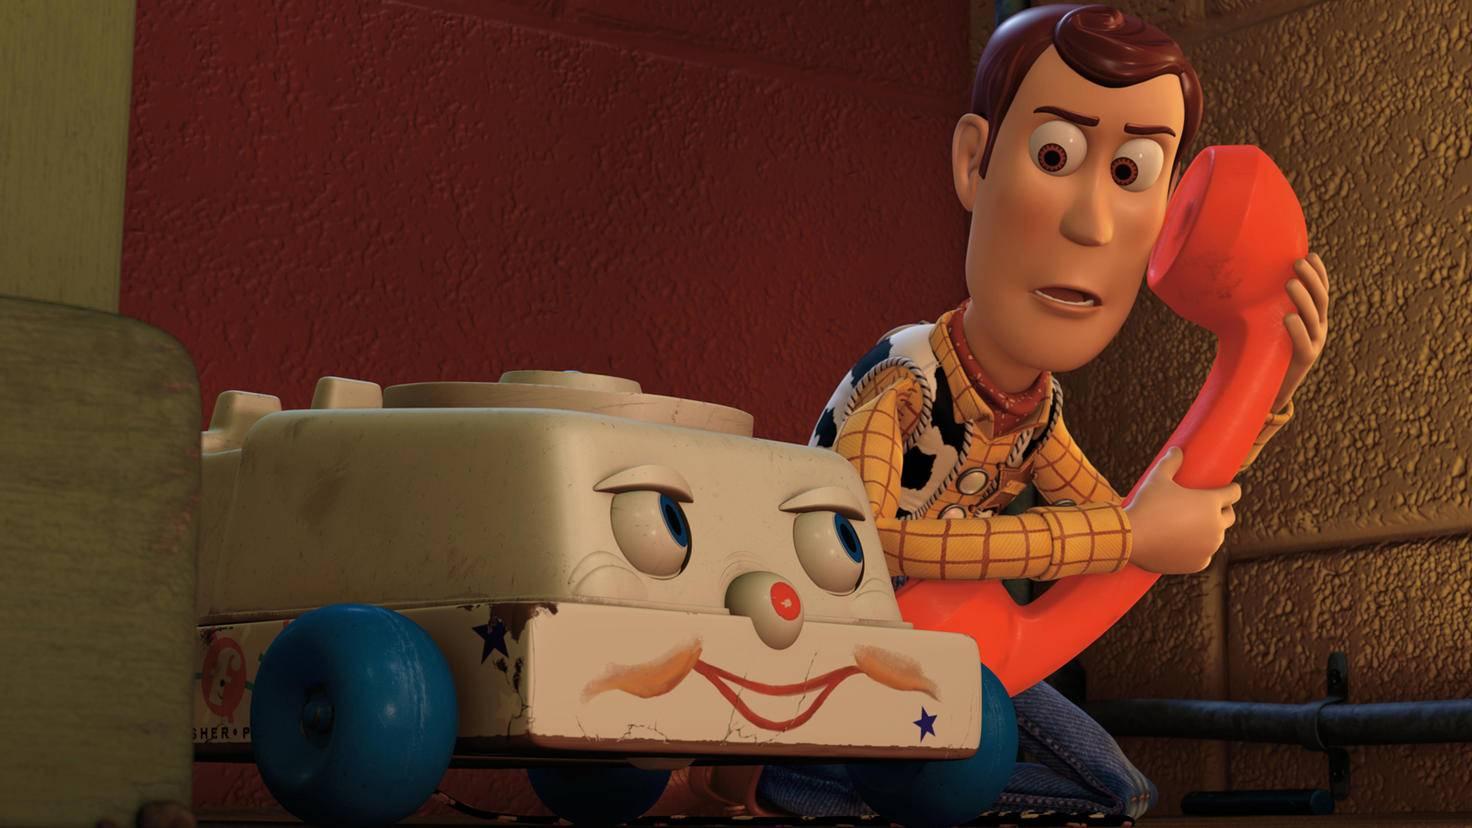 Toy Story 3-Woody-Disney Pixar